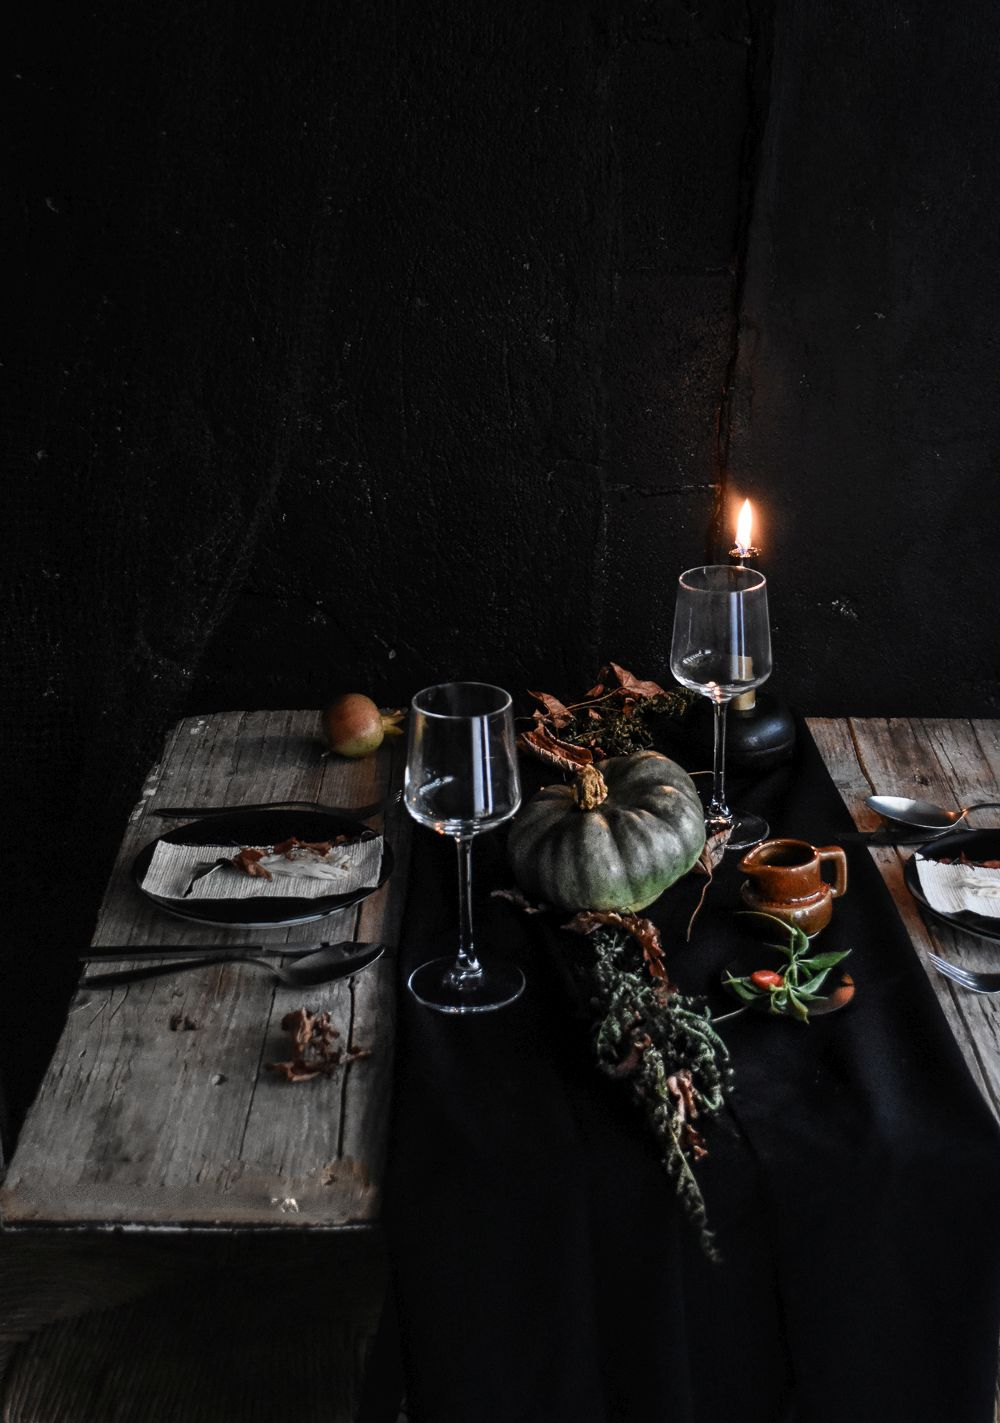 Halloween Table Setting Idea - black runer